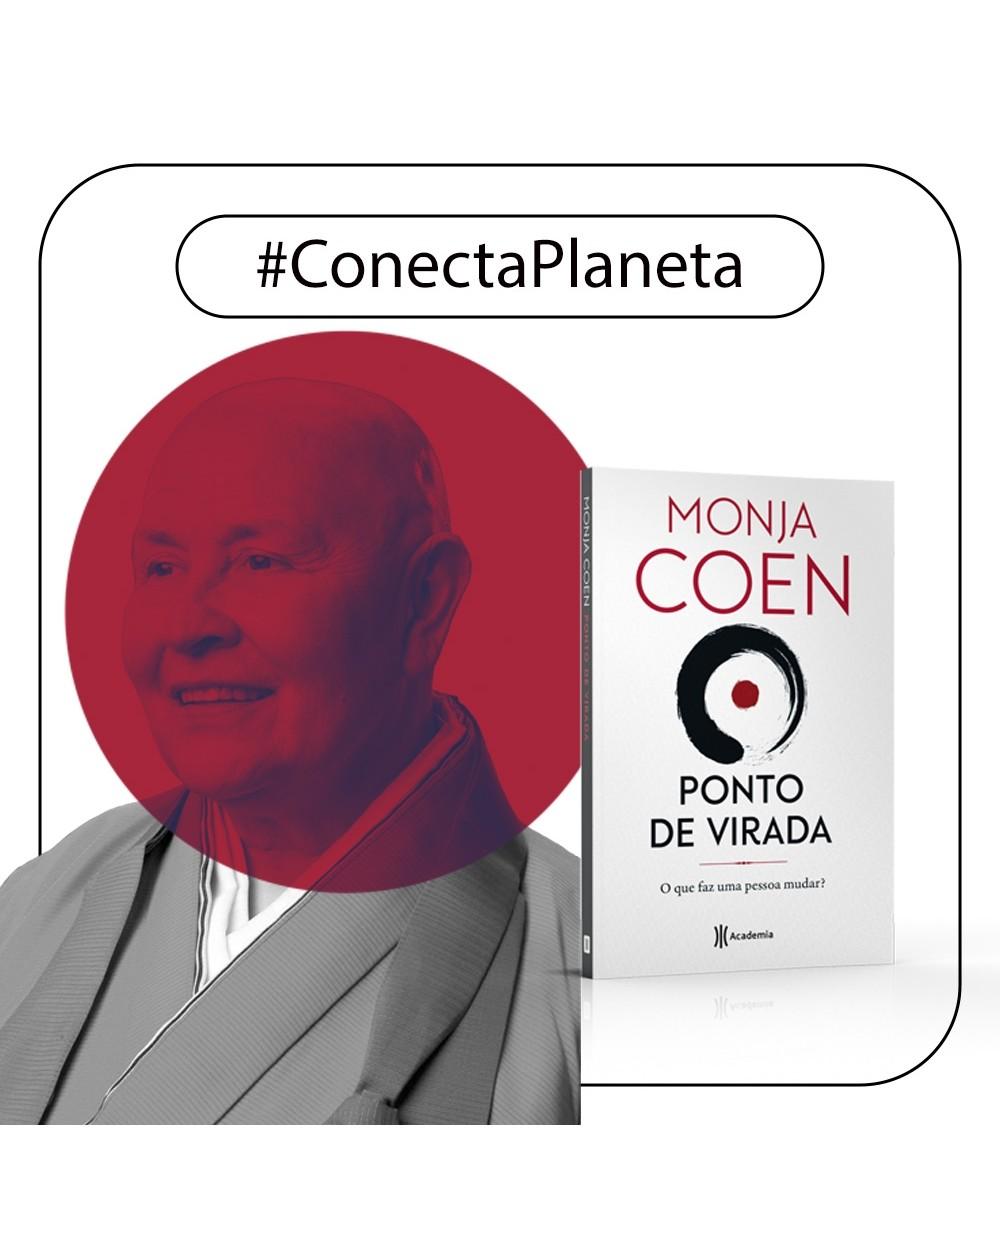 Ponto de virada - #ConectaPlaneta